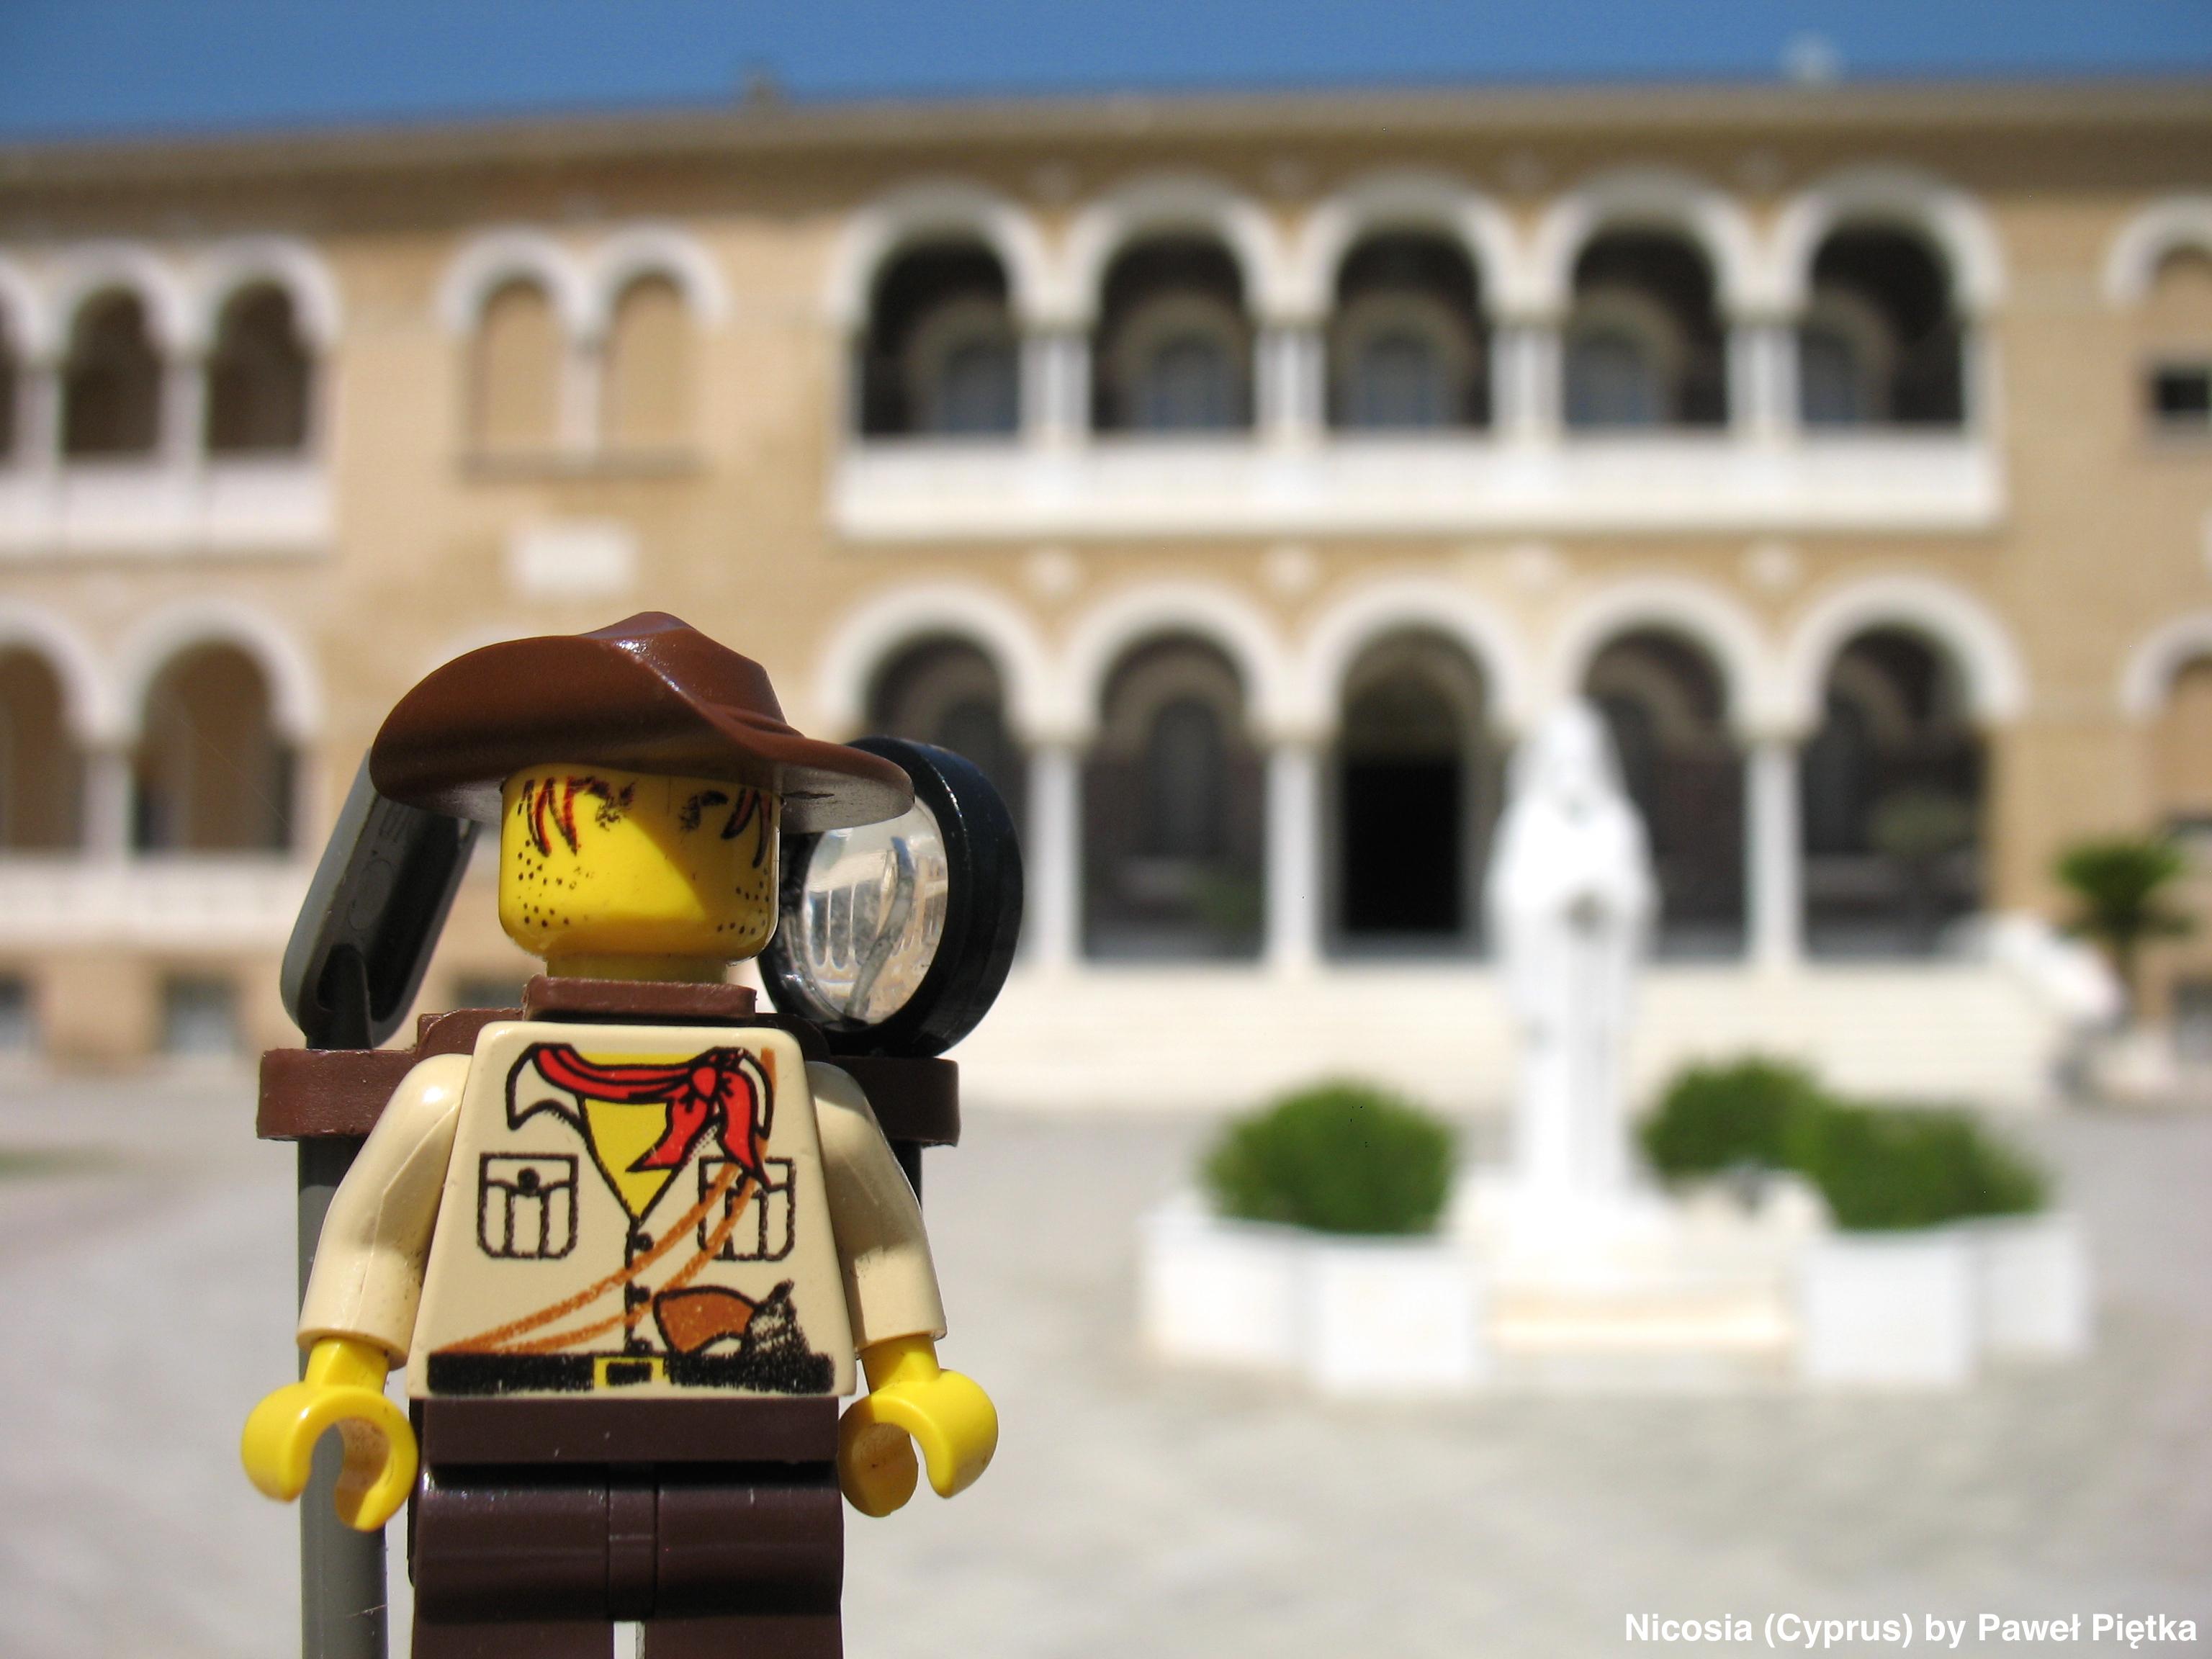 Nicosia (Cyprus) - Archbishop's Palace